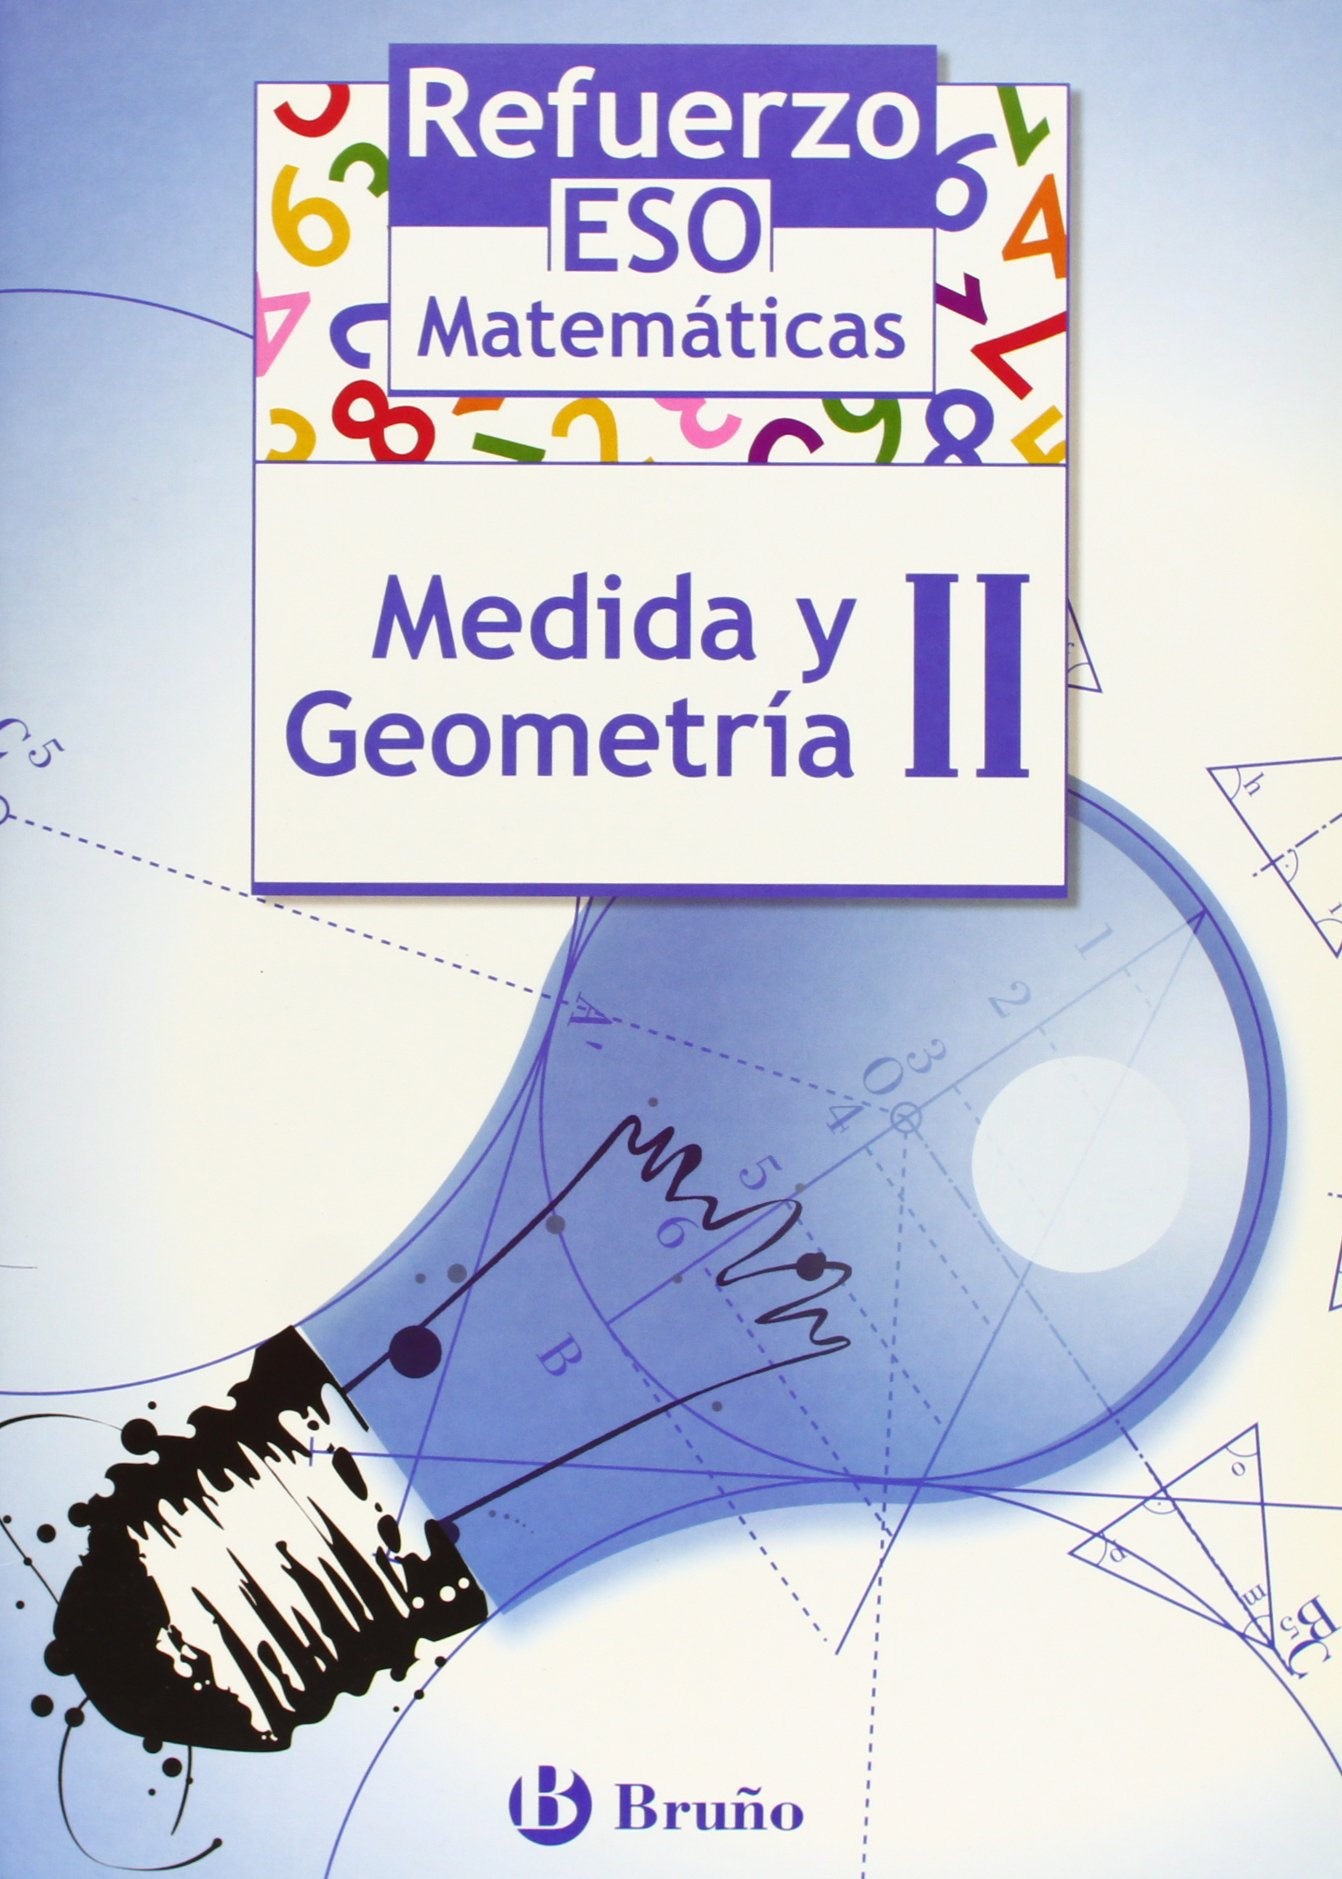 Download Refuerzo Matematicas ESO Medida y geometria/ Strengthening Mathematics Measurement and Geometry (Spanish Edition) ebook